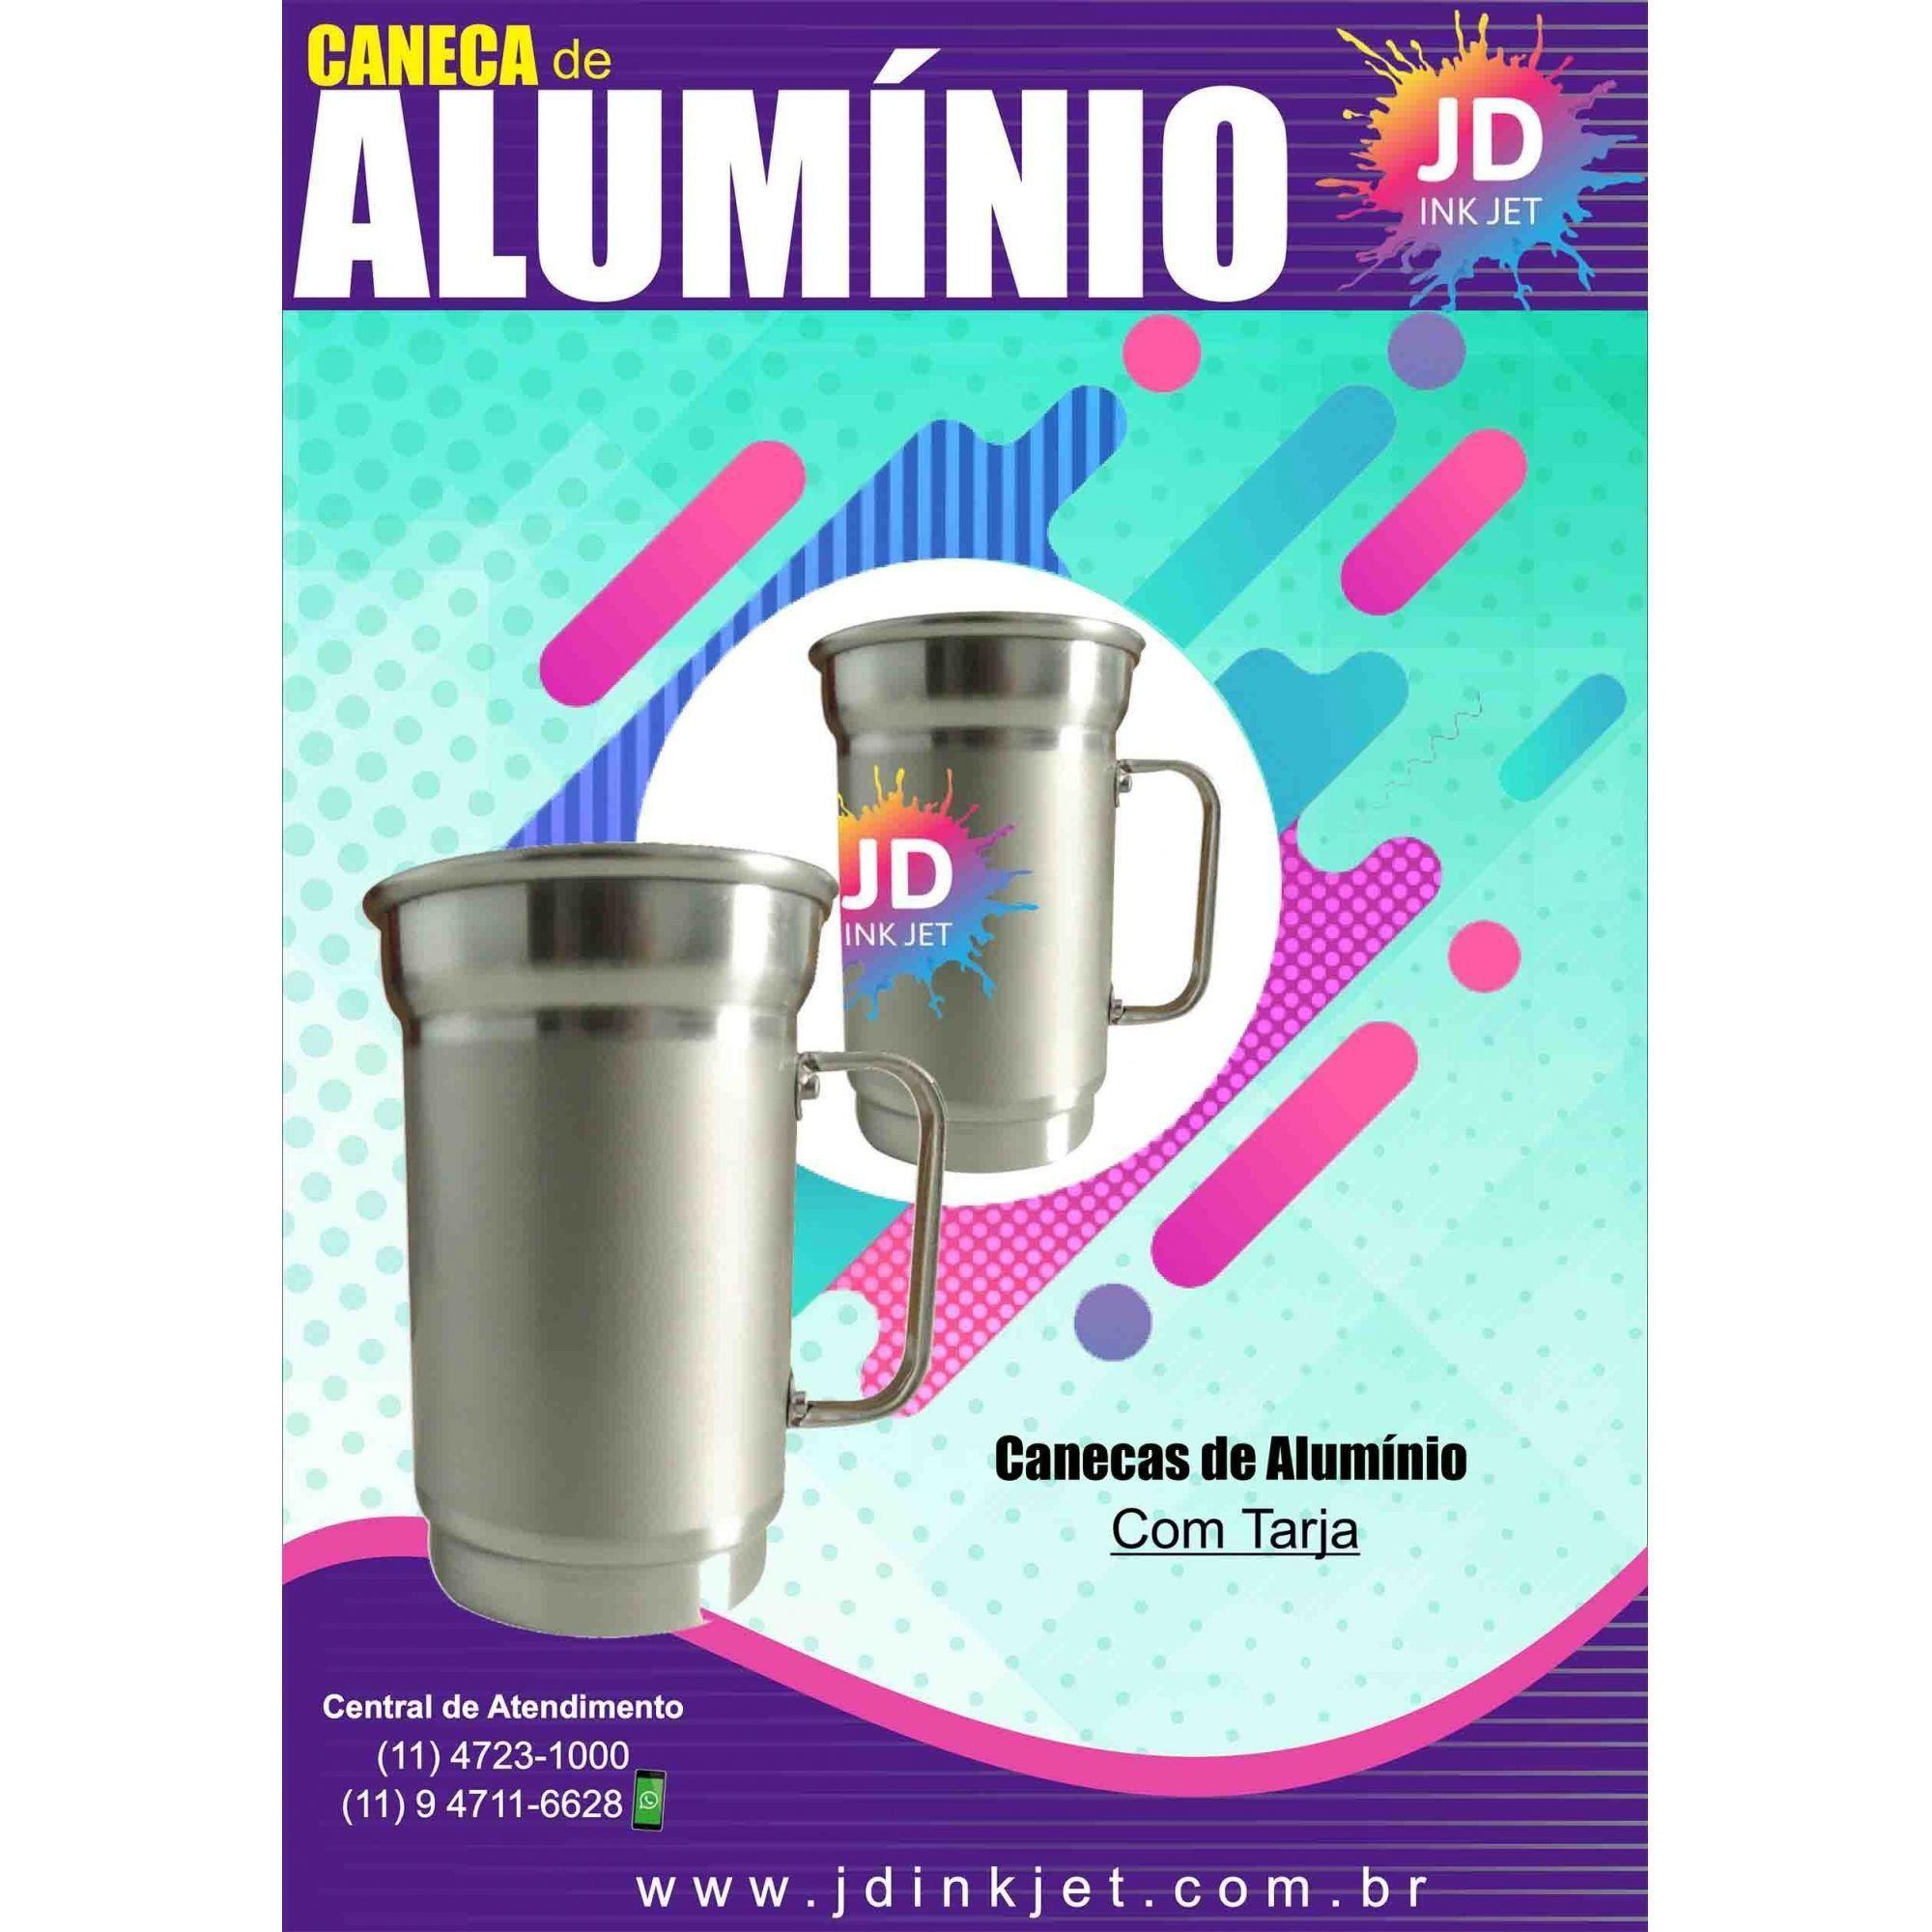 Caneca de Alumínio 650ml Com Tarja